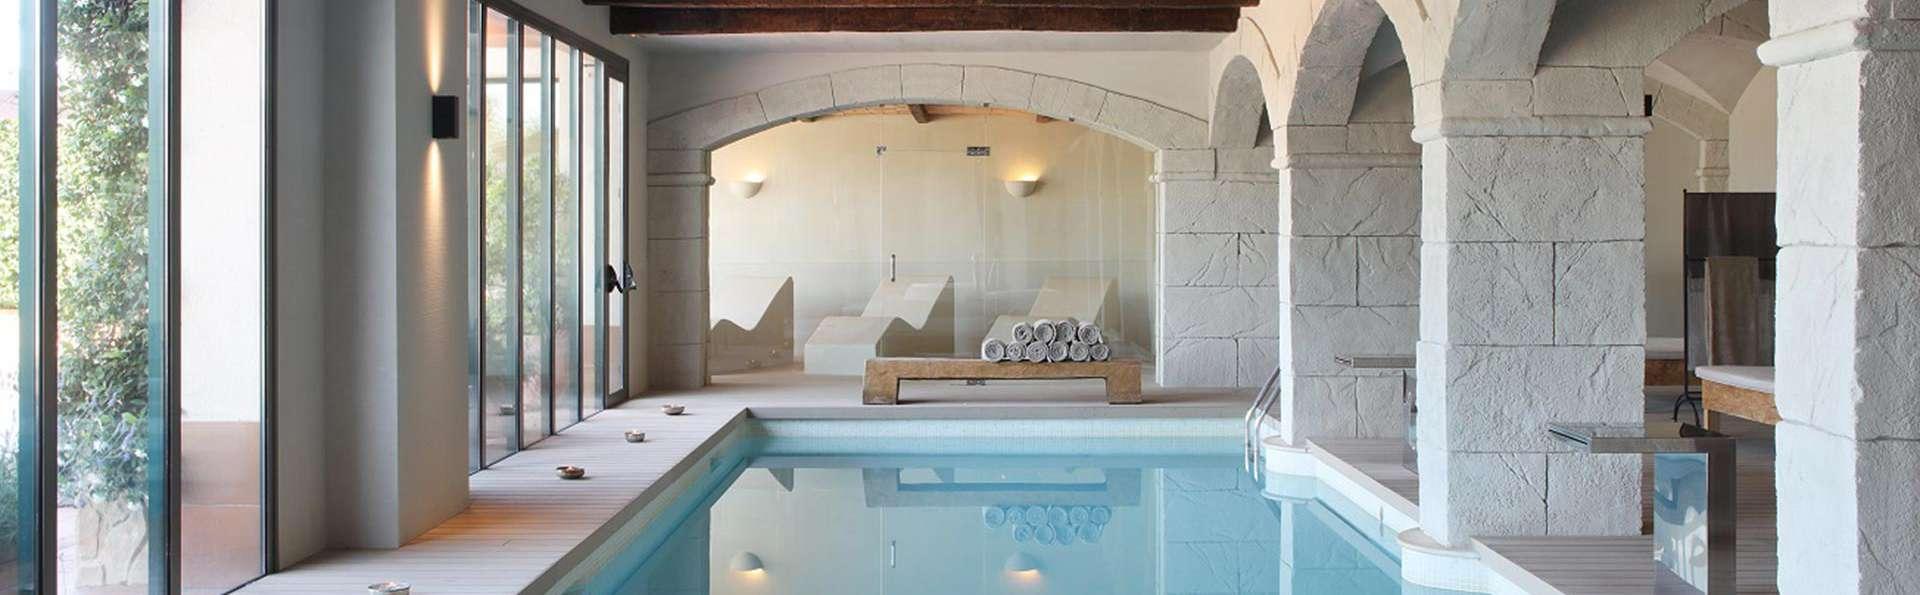 Luxe et glamour à Peralada avec accès au Wine Spa